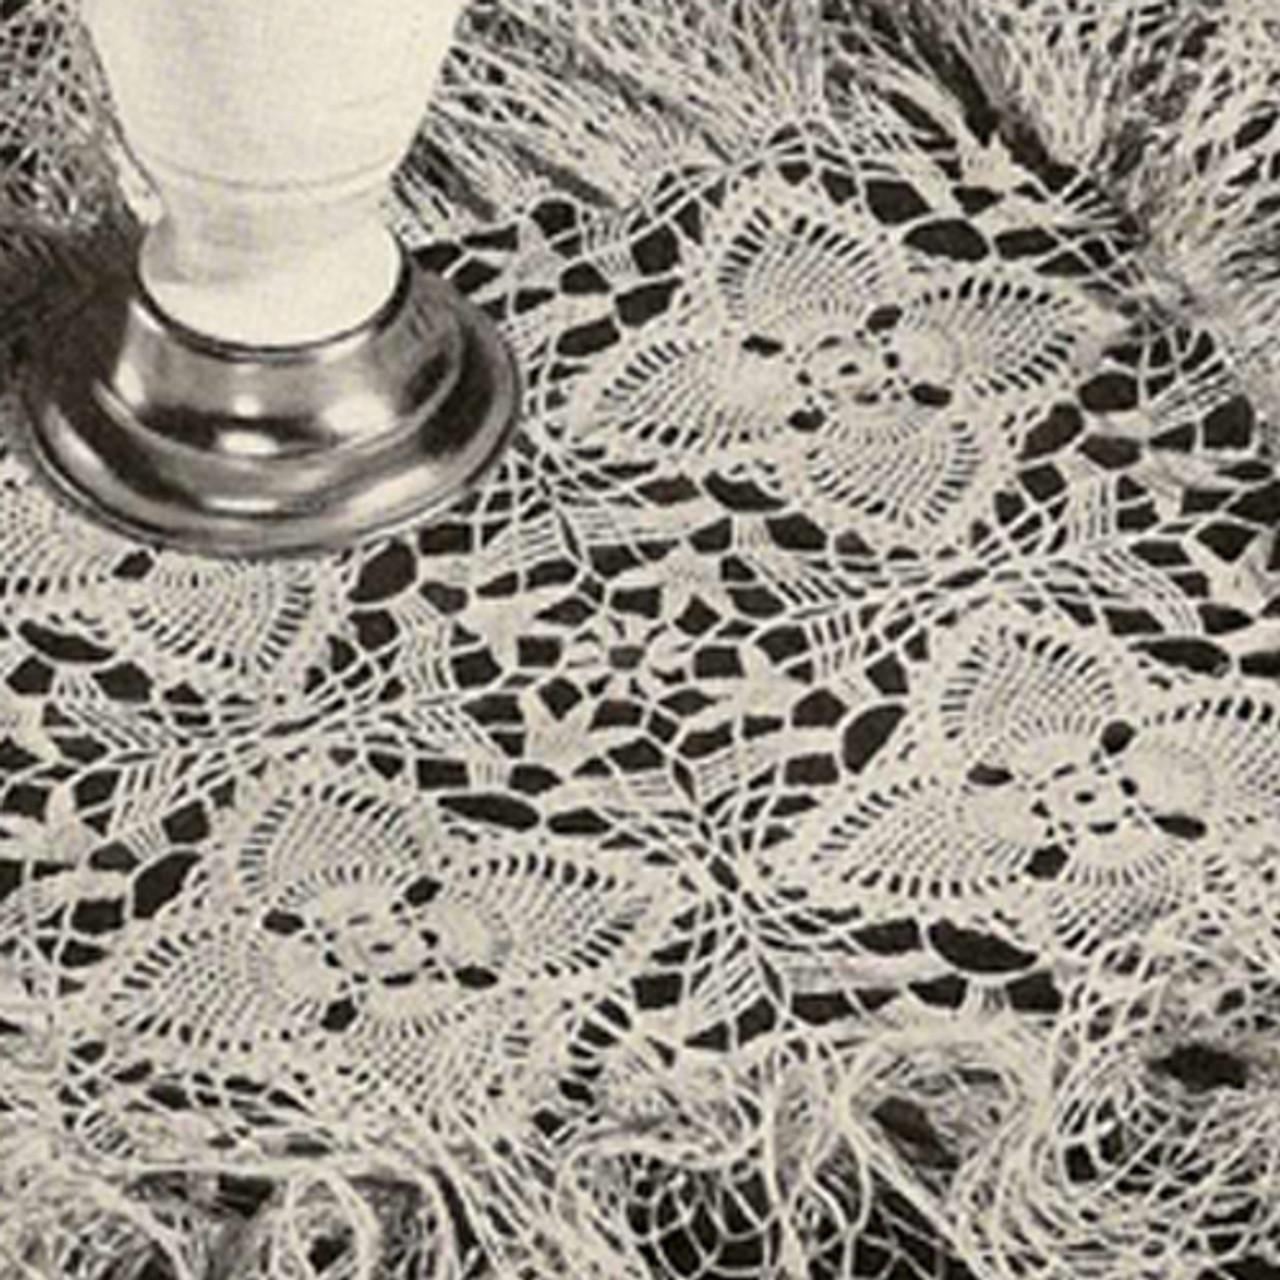 Pineapple Flower Doily Crochet Pattern, Vintage 1940s